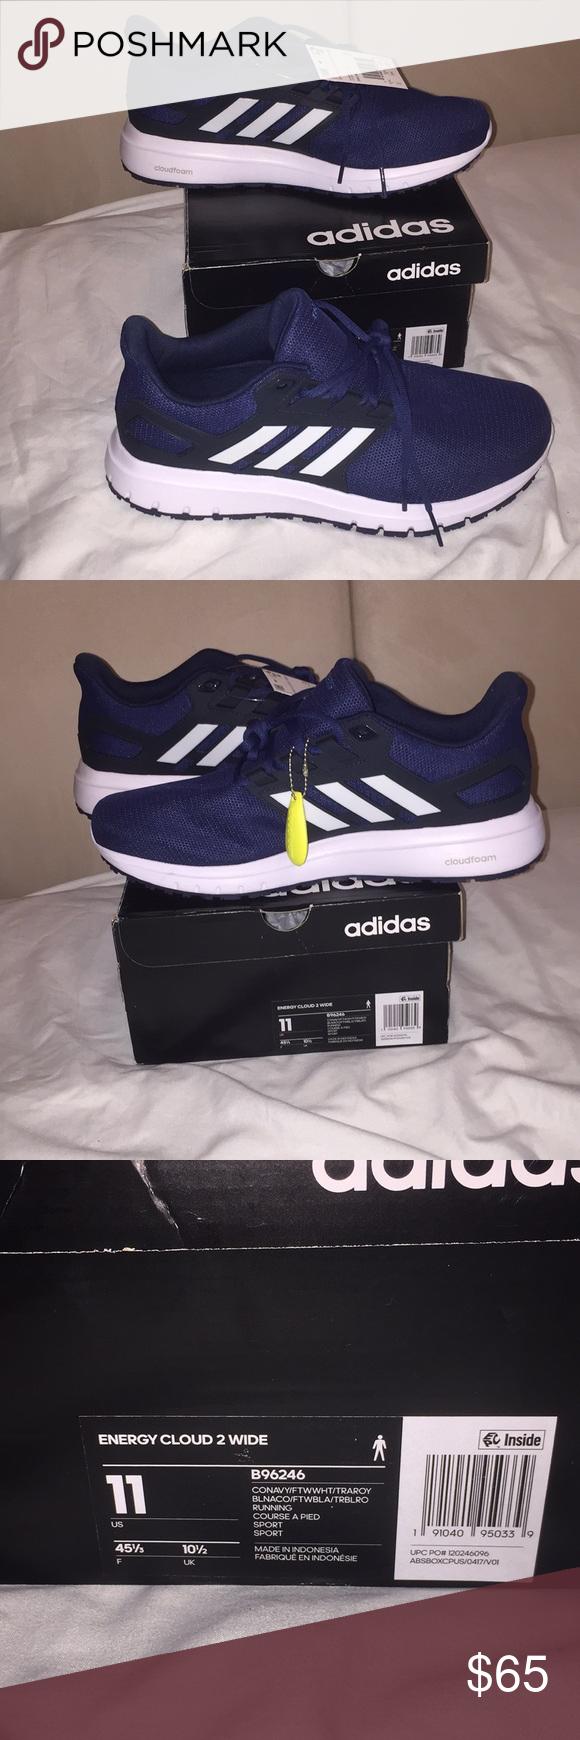 Nwt Men S Adidas Energy Cloud 2 Running Shoes 11w Clothes Design Fashion Design Blue Adidas